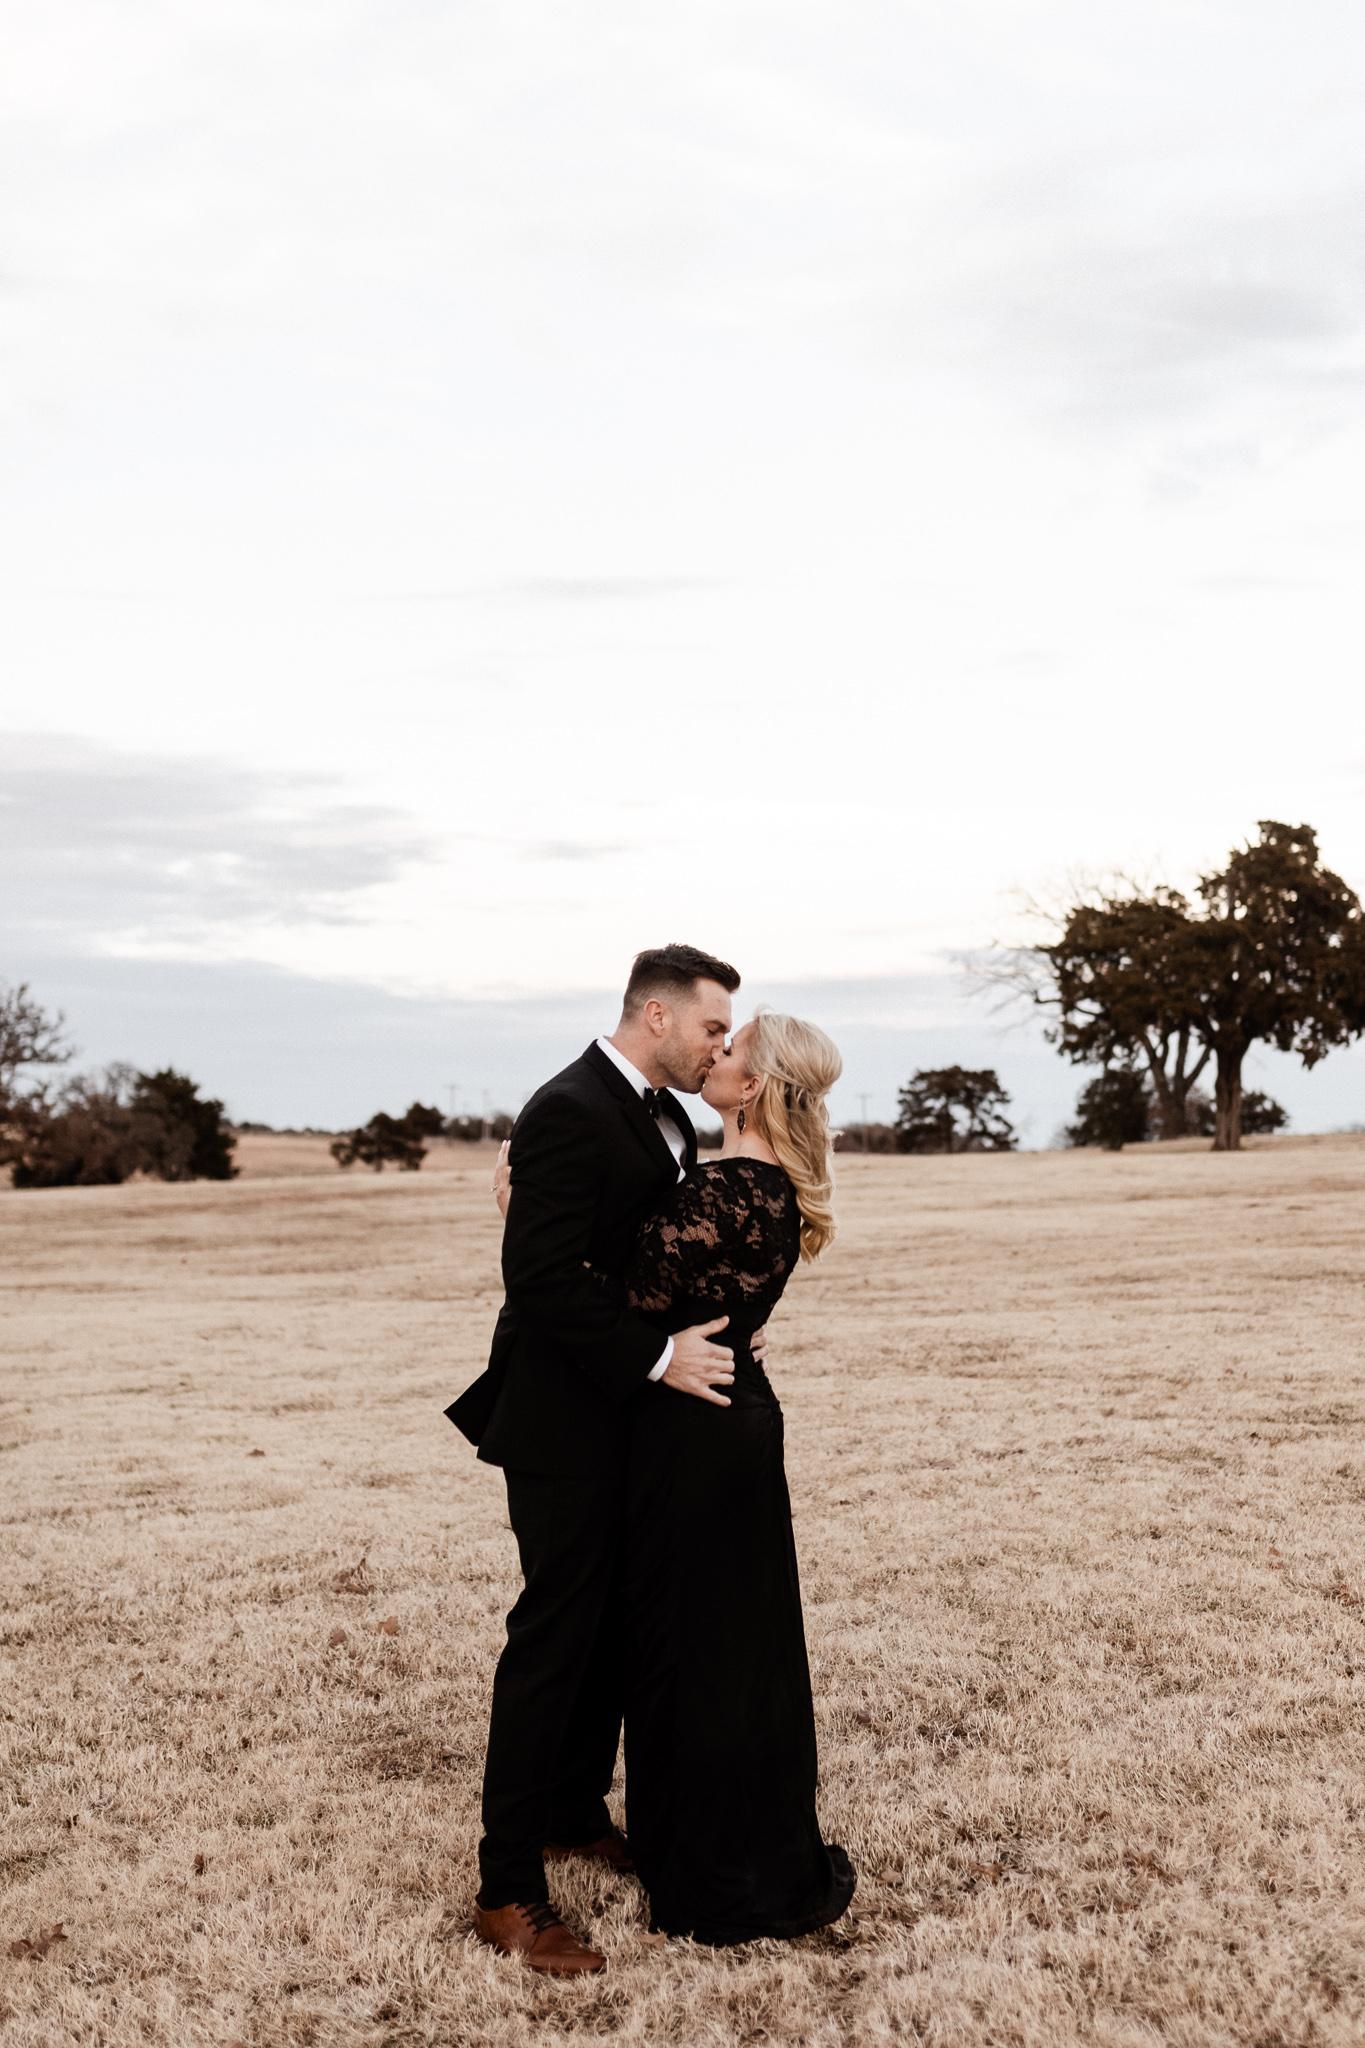 Wade + Stephanie | Warm Open Field Engagements | Oklahoma Wedding Photographer-54.jpg